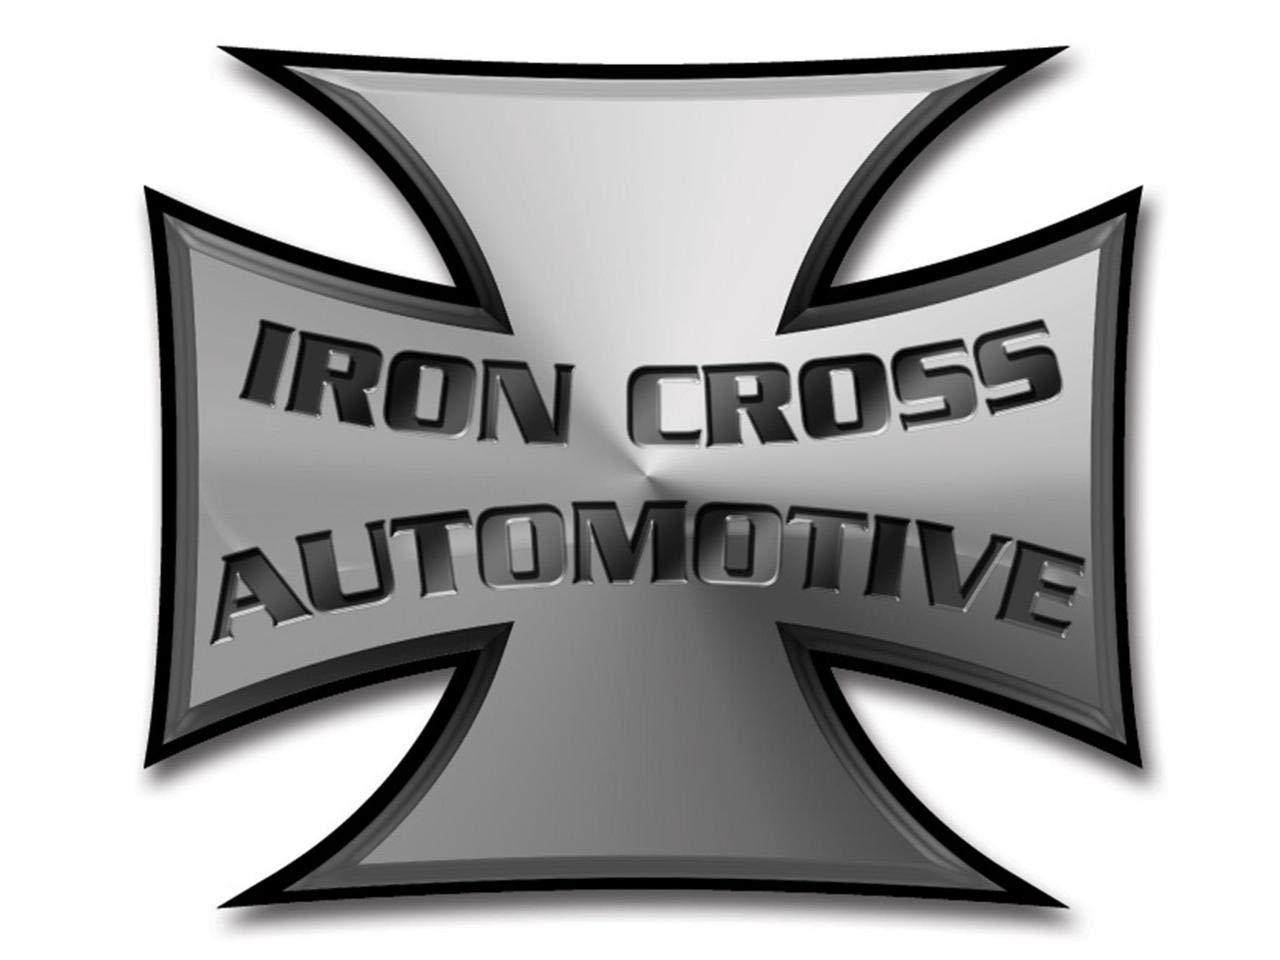 Iron Cross Automotive 99-612 Bracket Kit for HD Step 2002-2008 Dodge Ram Trucks